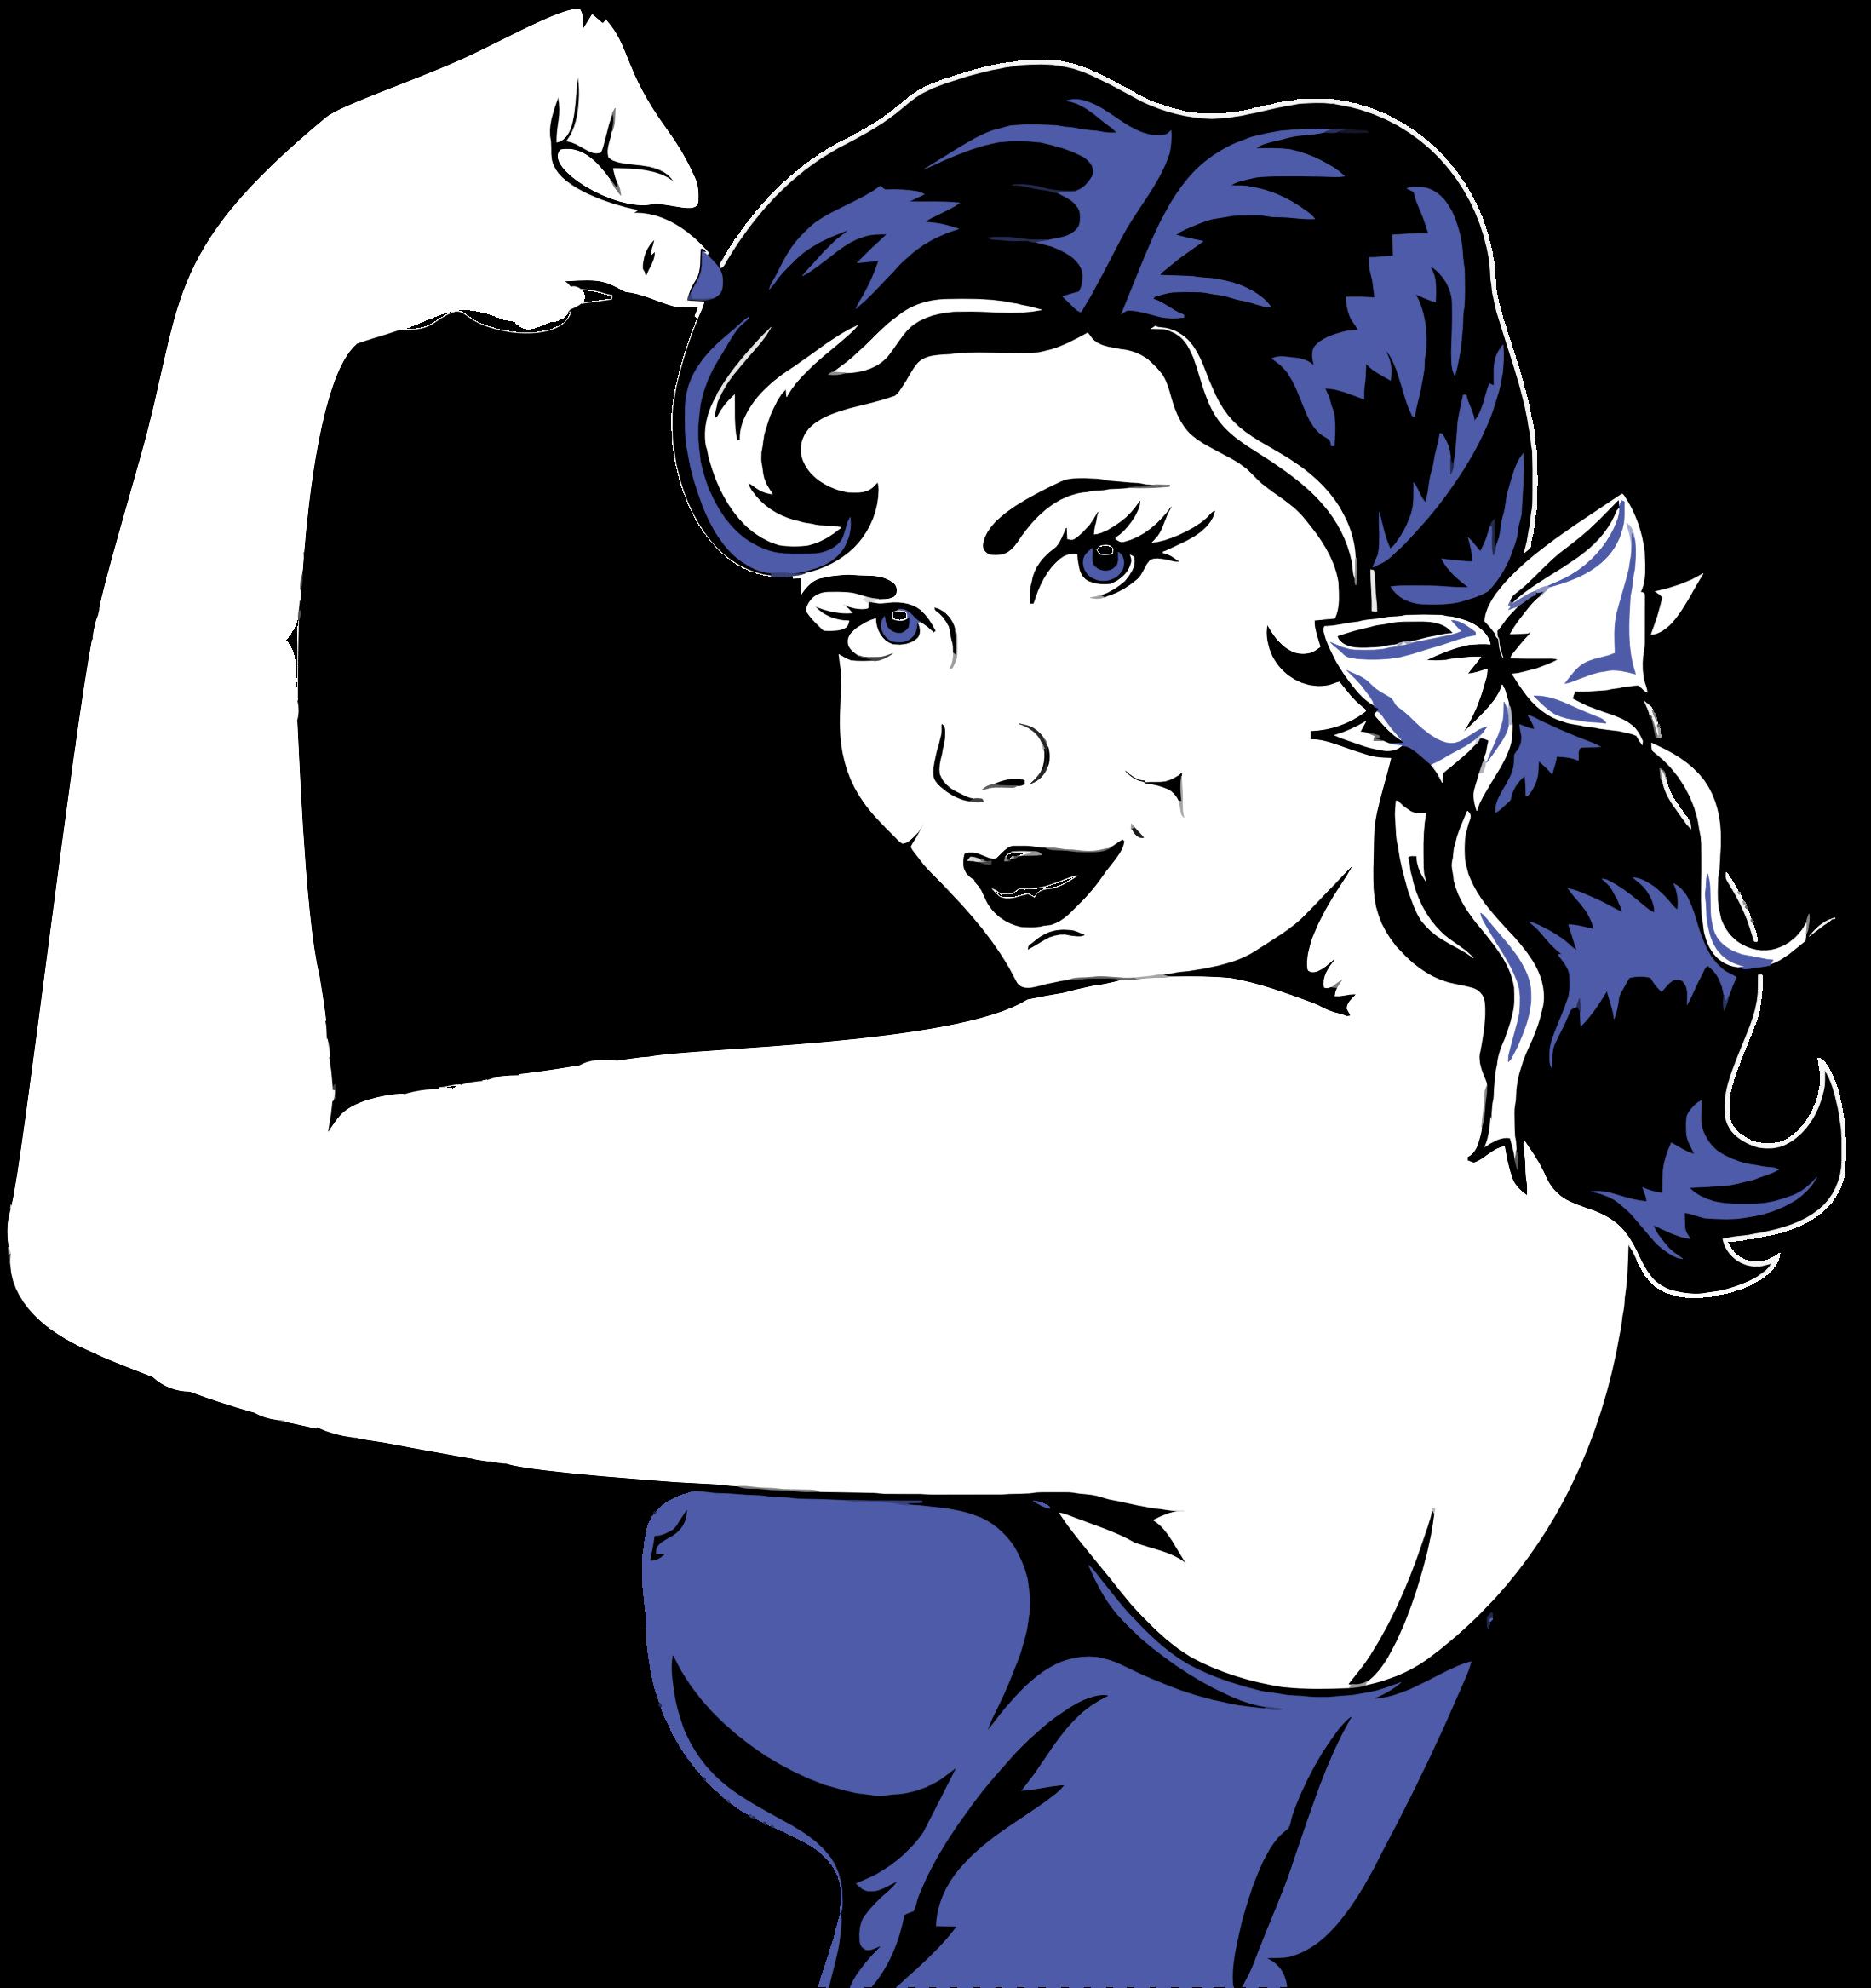 Flexing muscle big image. Politics clipart woman suffrage